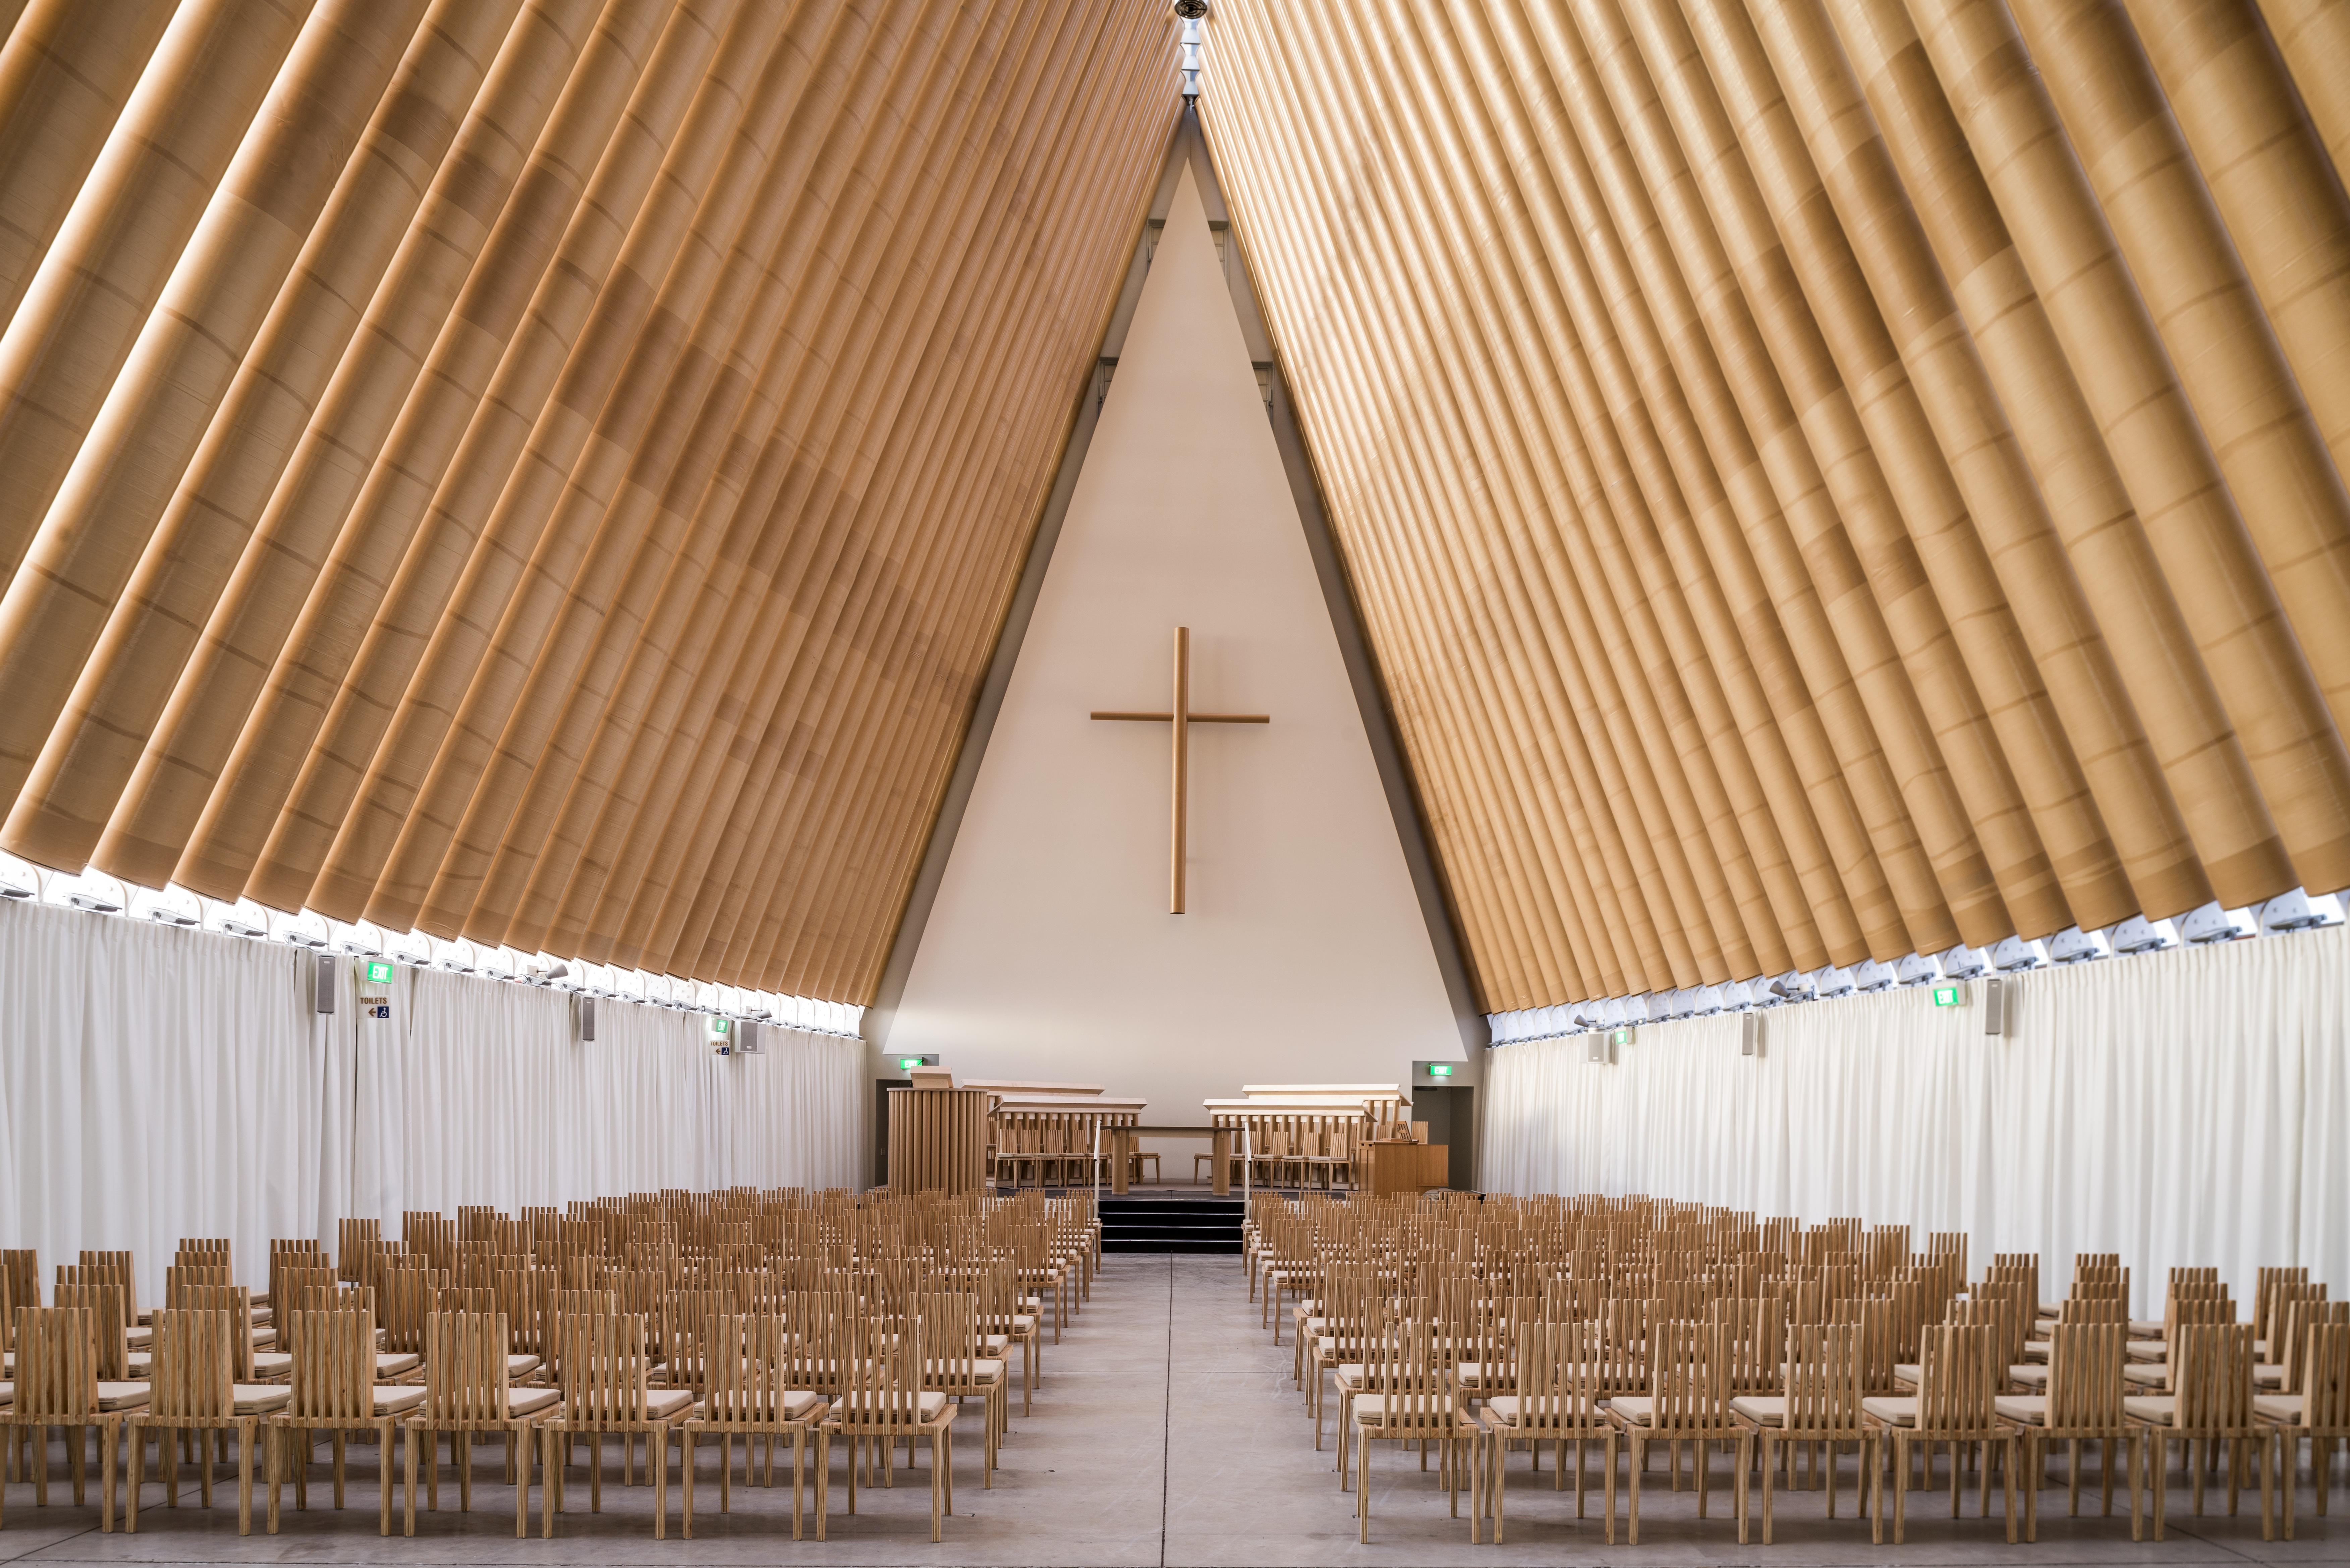 cardboard cathedral architect magazine shigeru ban architects christchurch new zealand. Black Bedroom Furniture Sets. Home Design Ideas